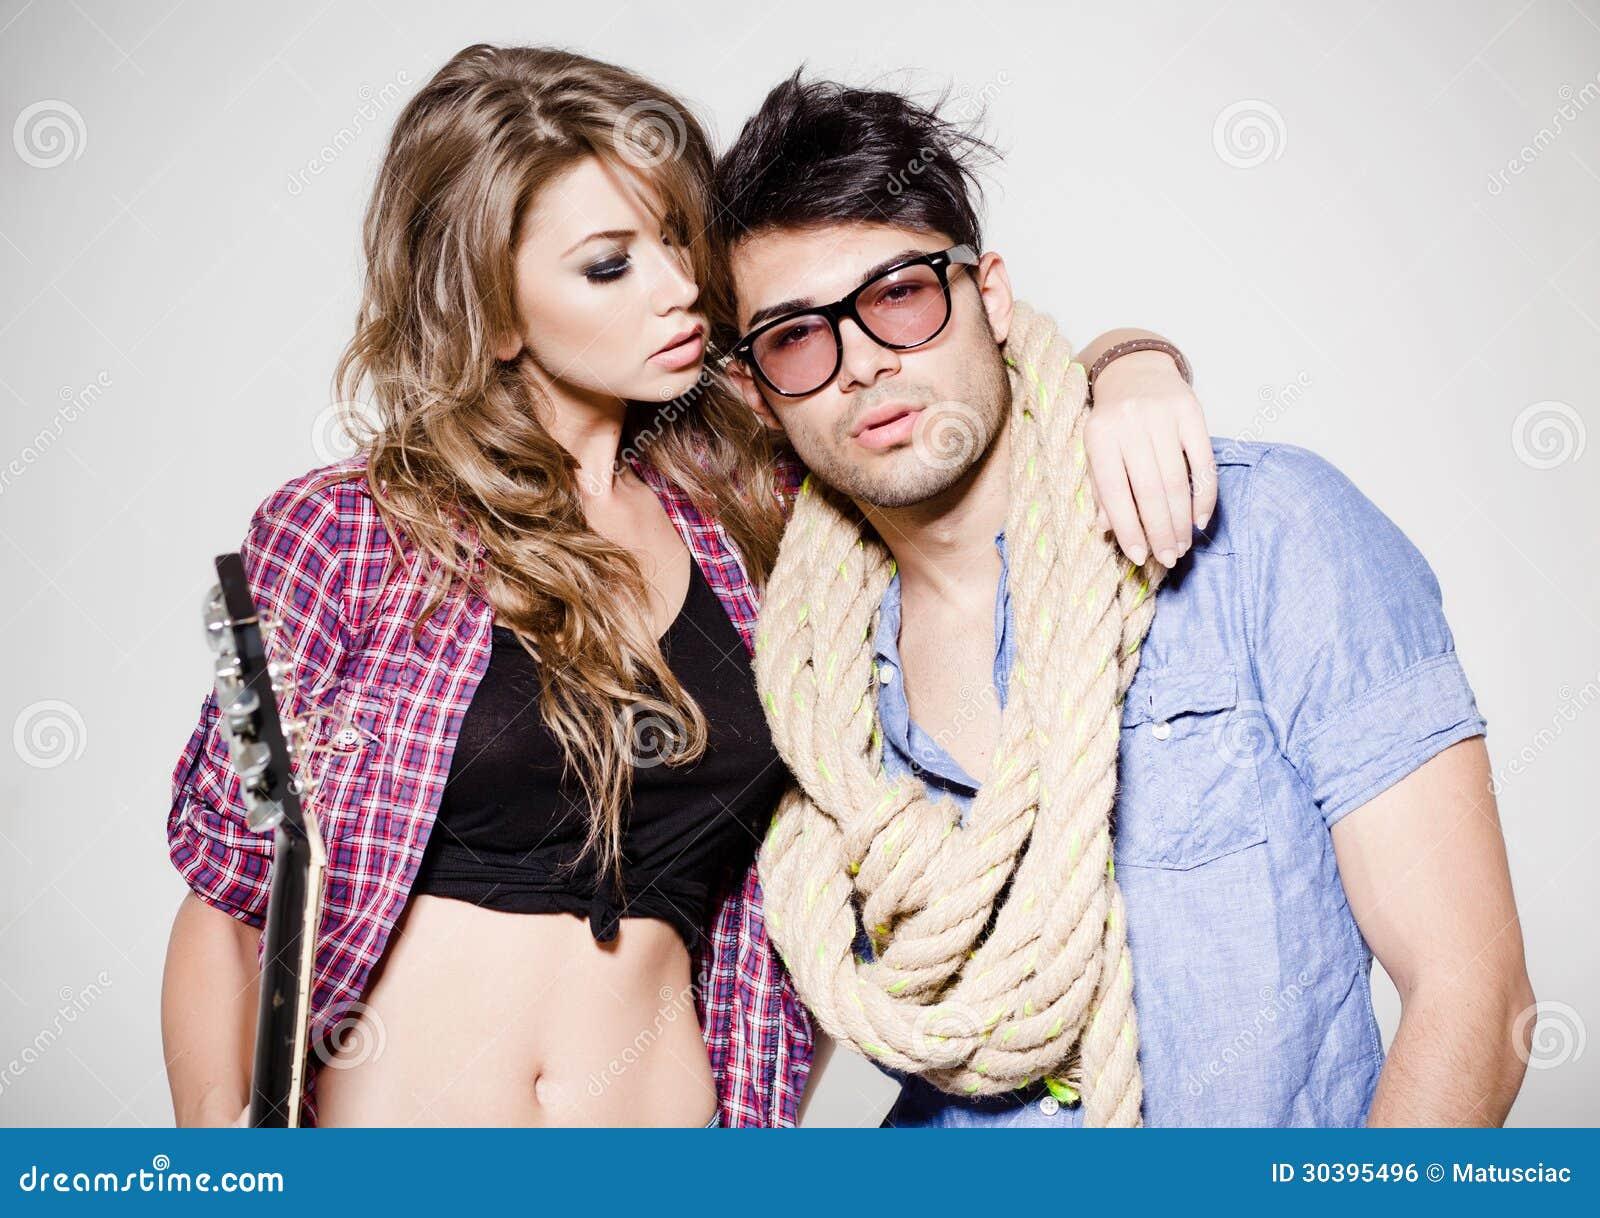 fashionable couple wearing jeans posing dramatic